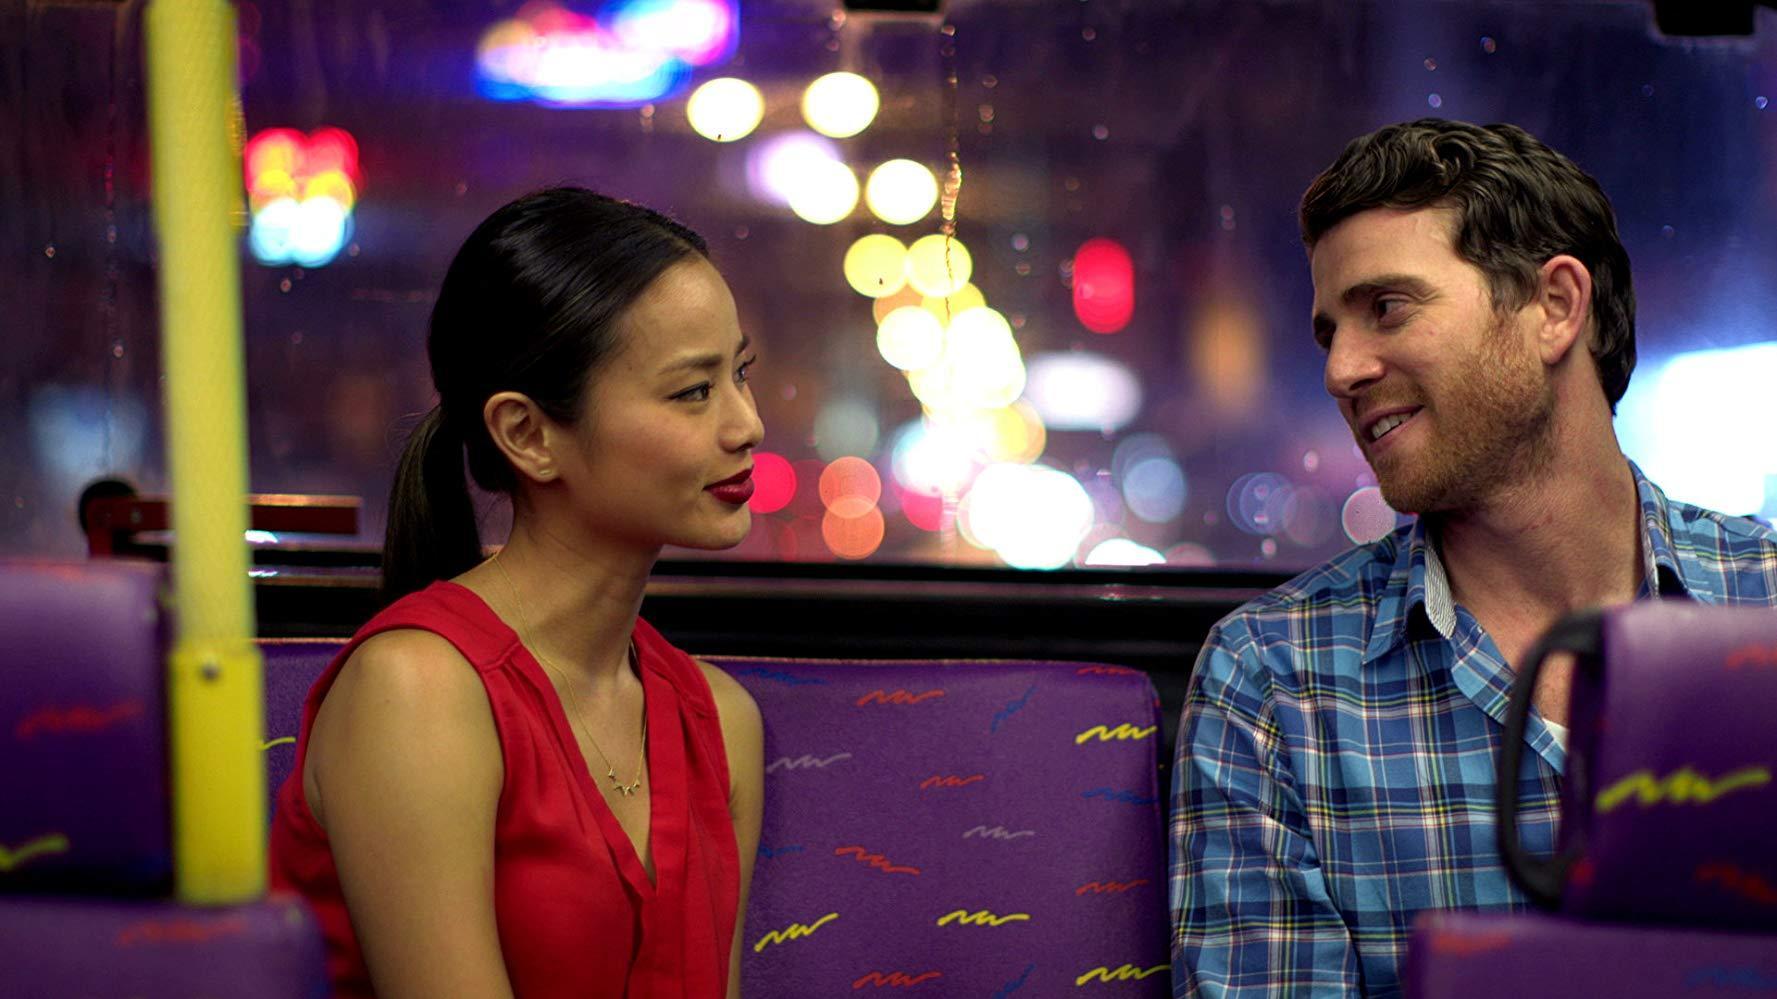 مشاهدة فيلم Already Tomorrow in Hong Kong 2015 HD مترجم كامل اون لاين